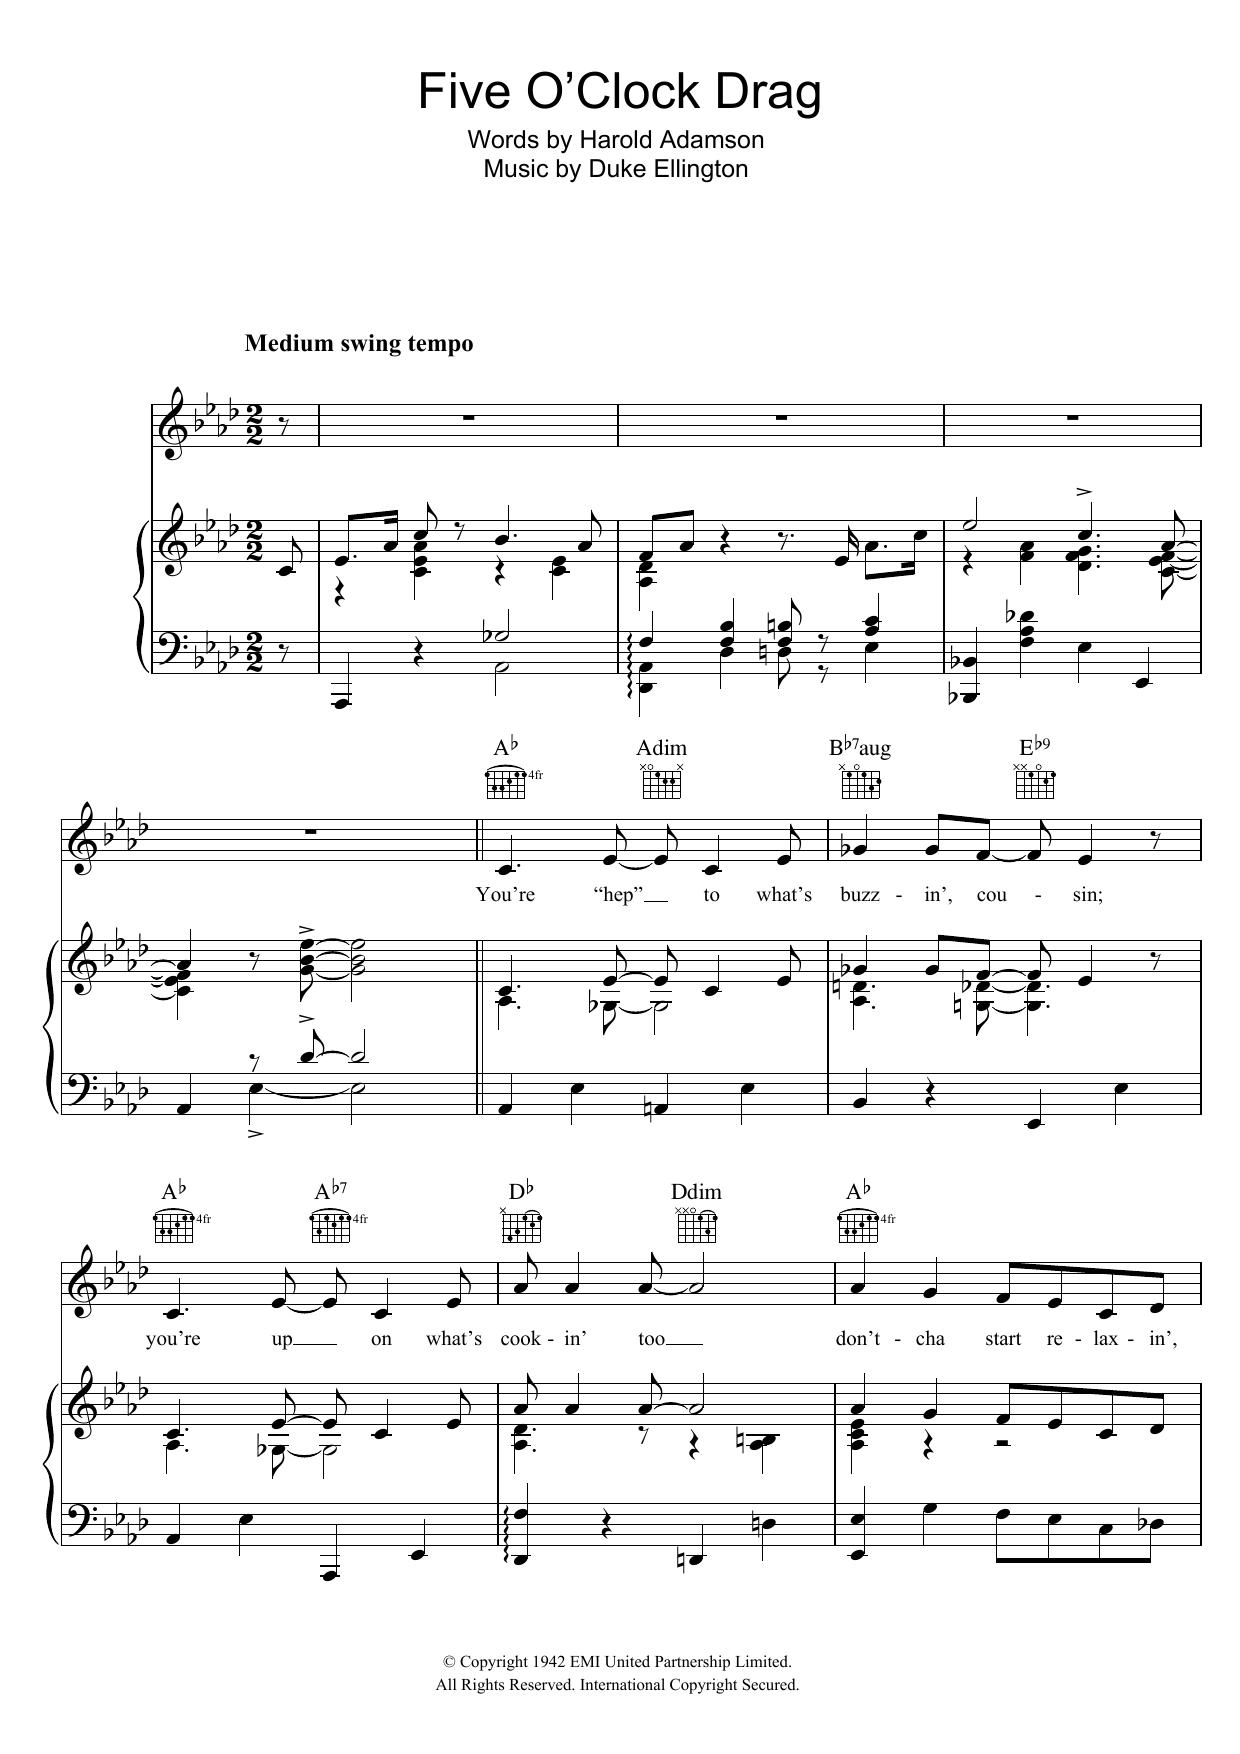 Duke Ellington: Five O'Clock Drag